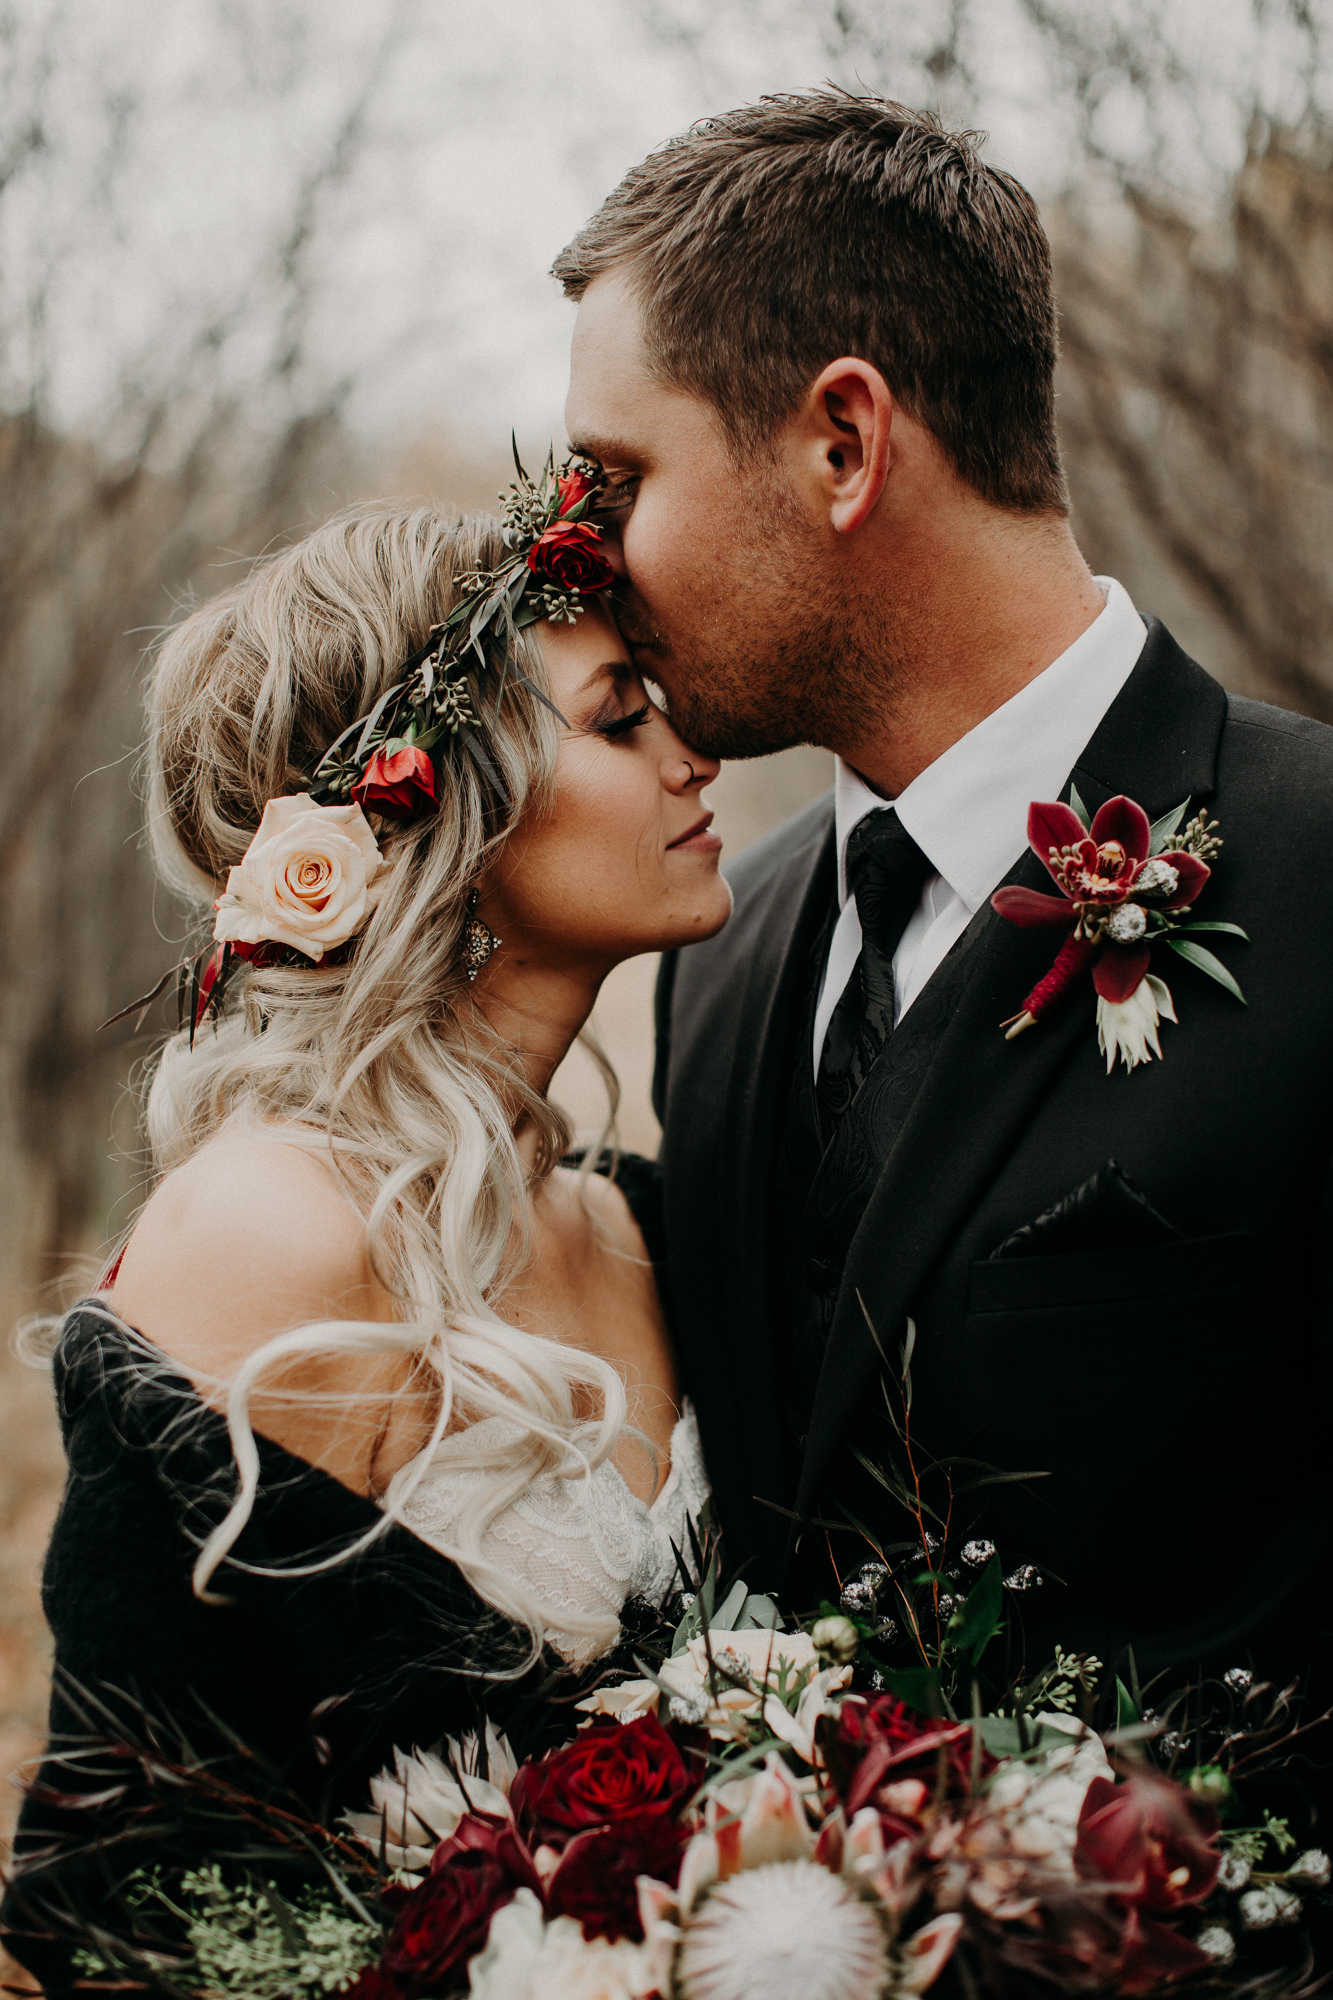 Vancouver-Wedding-Photographer-Candice-Marie-Photography-7.jpg